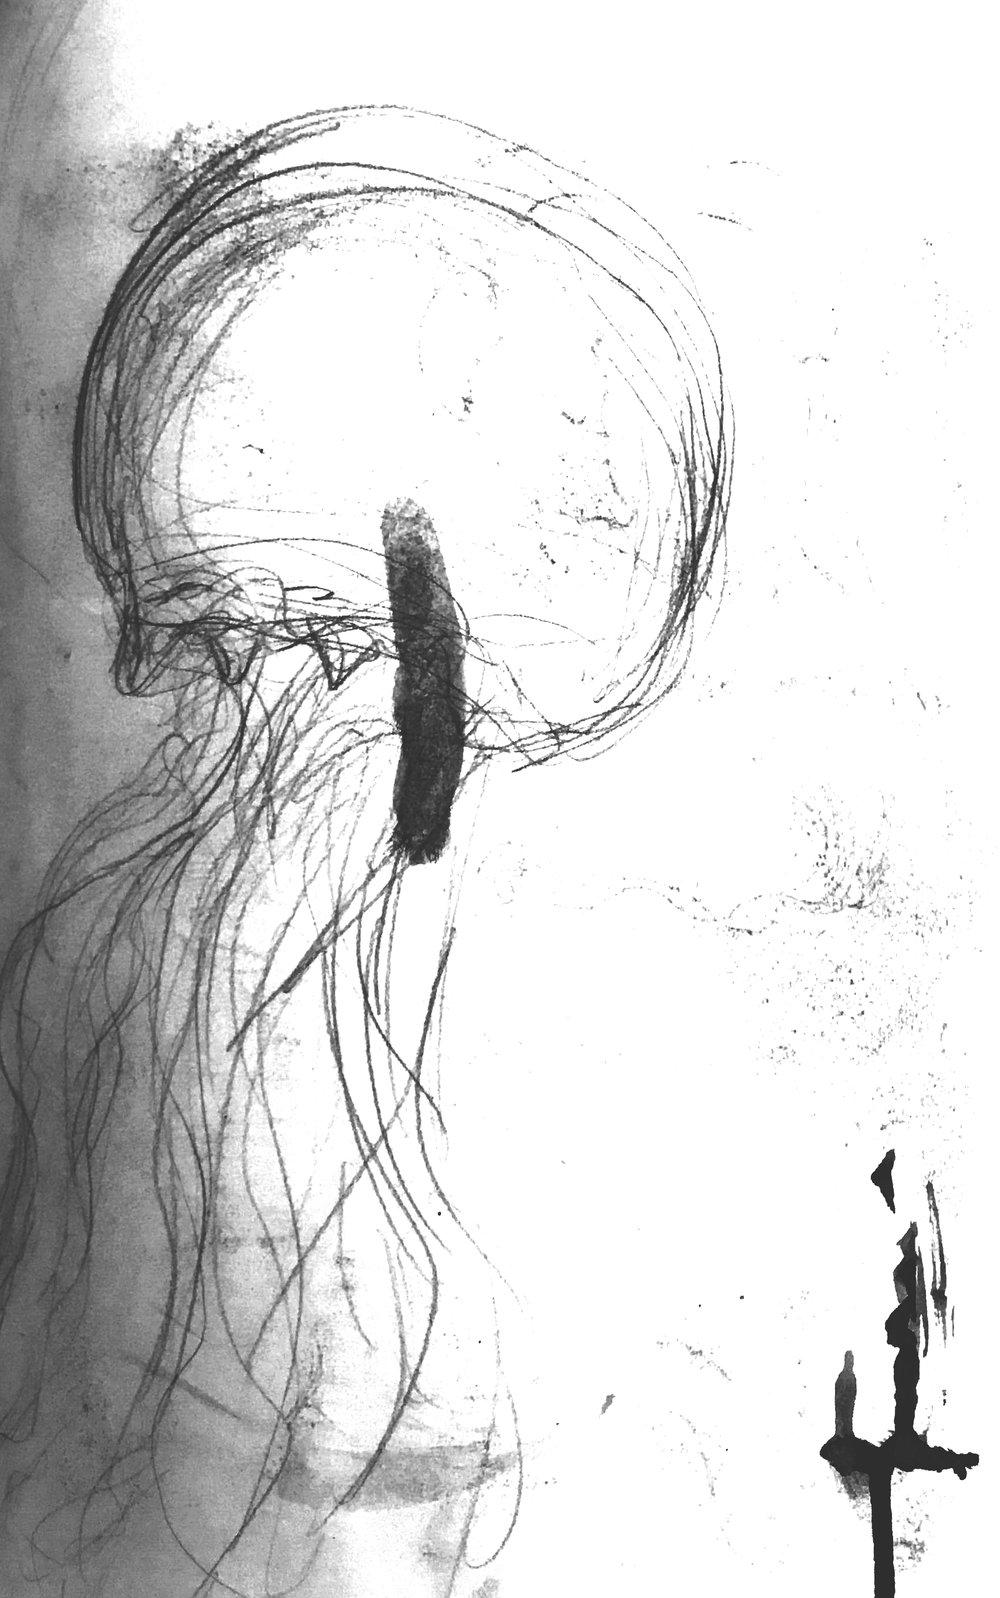 Sketch-Seascape-5.jpg